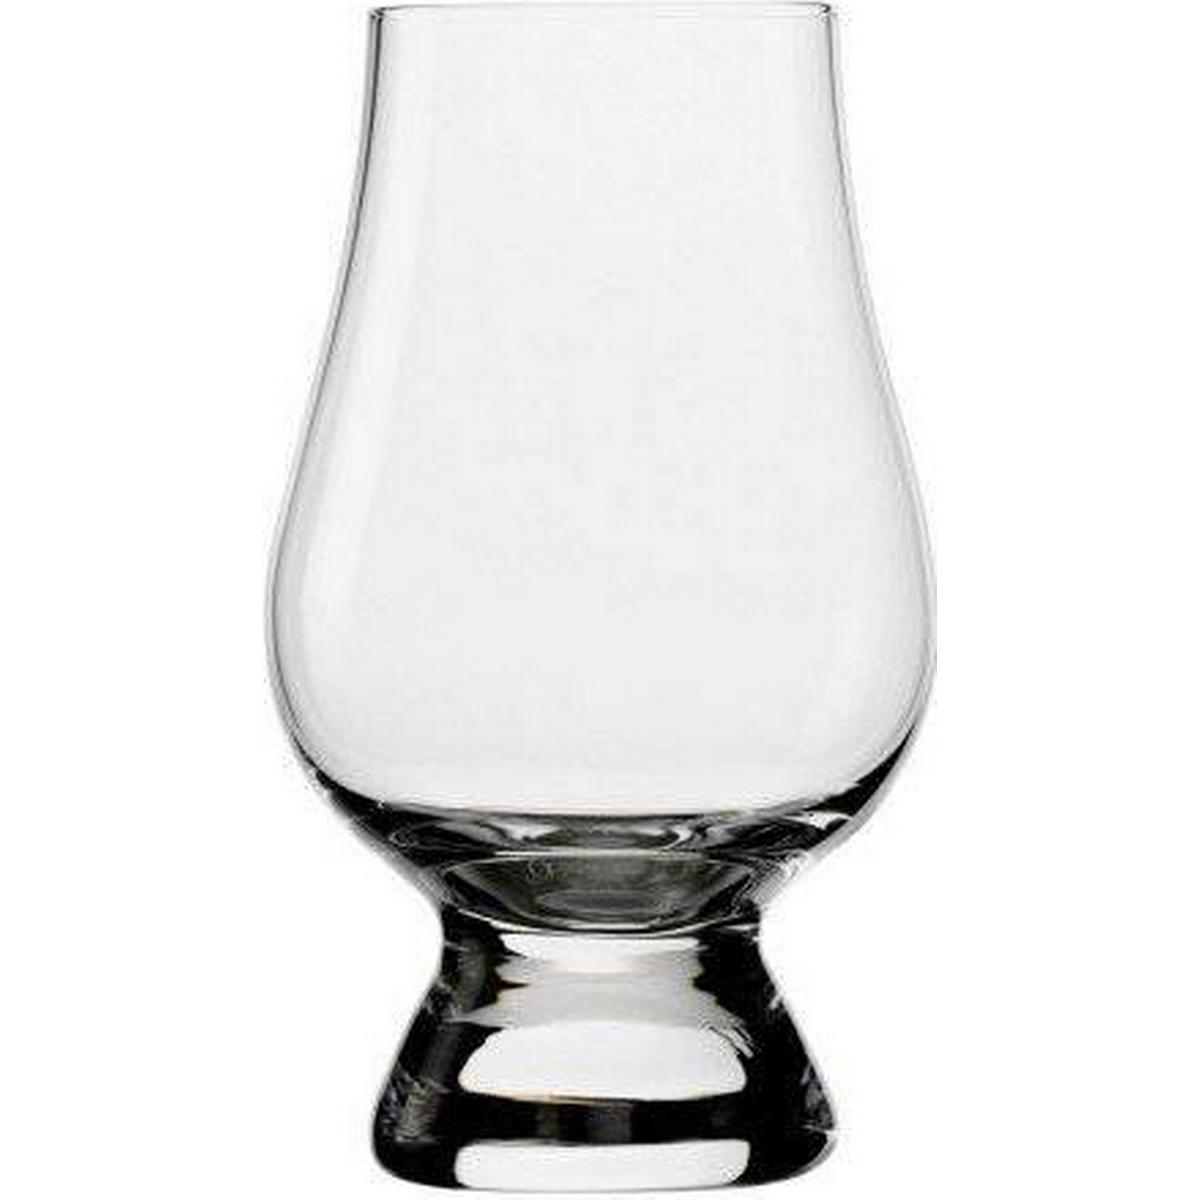 Whiskyglas Diskmaskinsvänlig (600+ produkter) hos